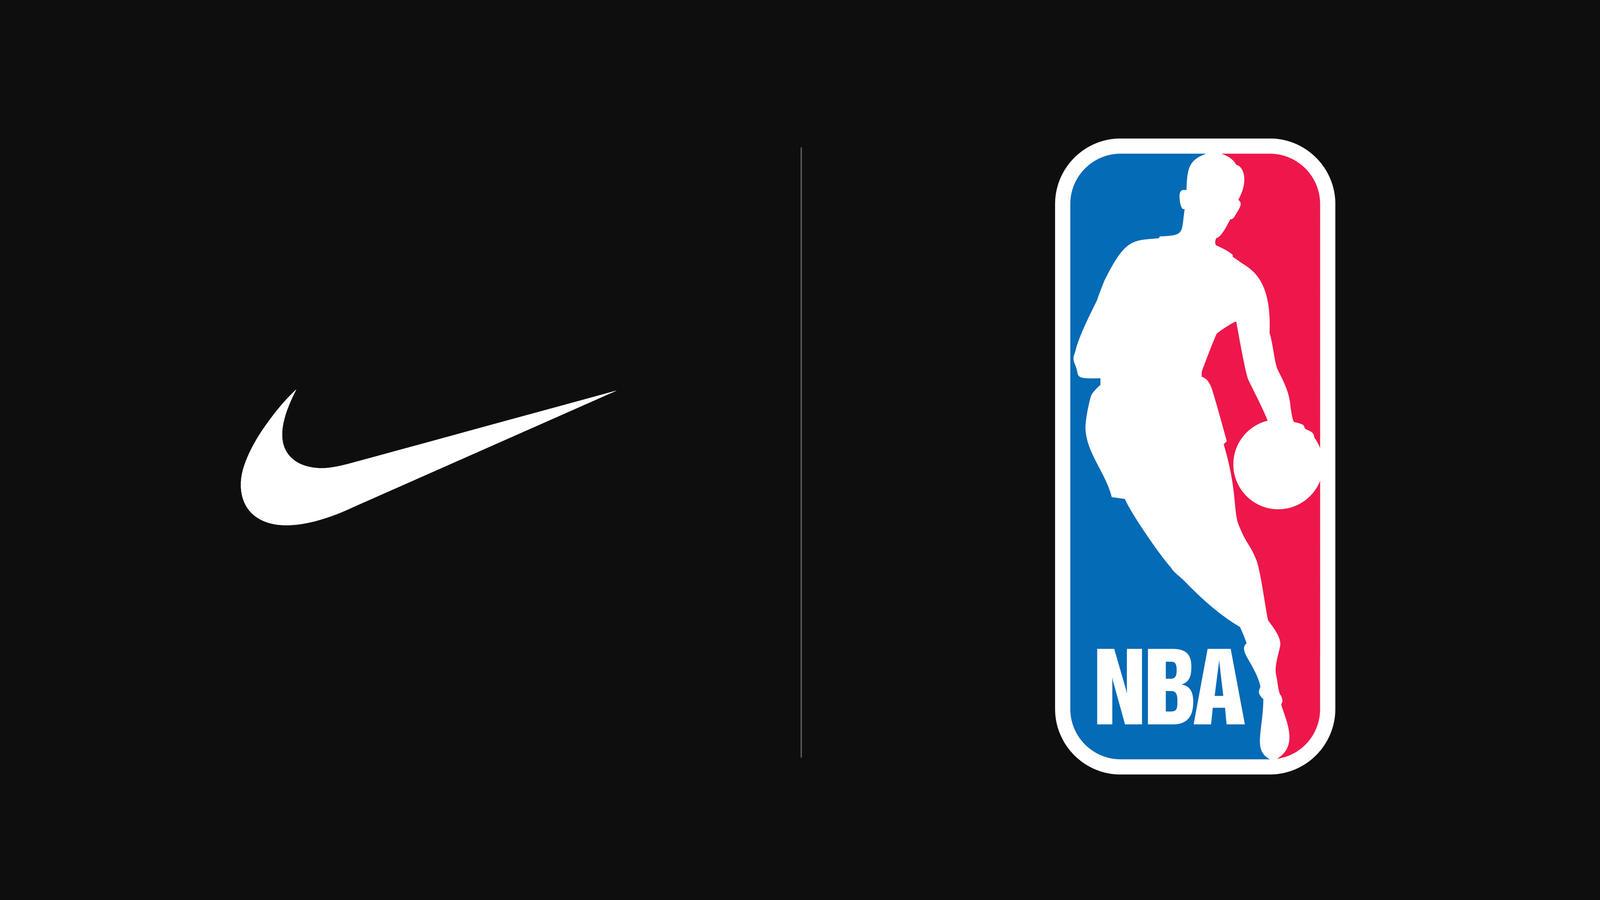 nike basketball logos rh logolynx com Nike Galaxy Logo Nike Swoosh Logo